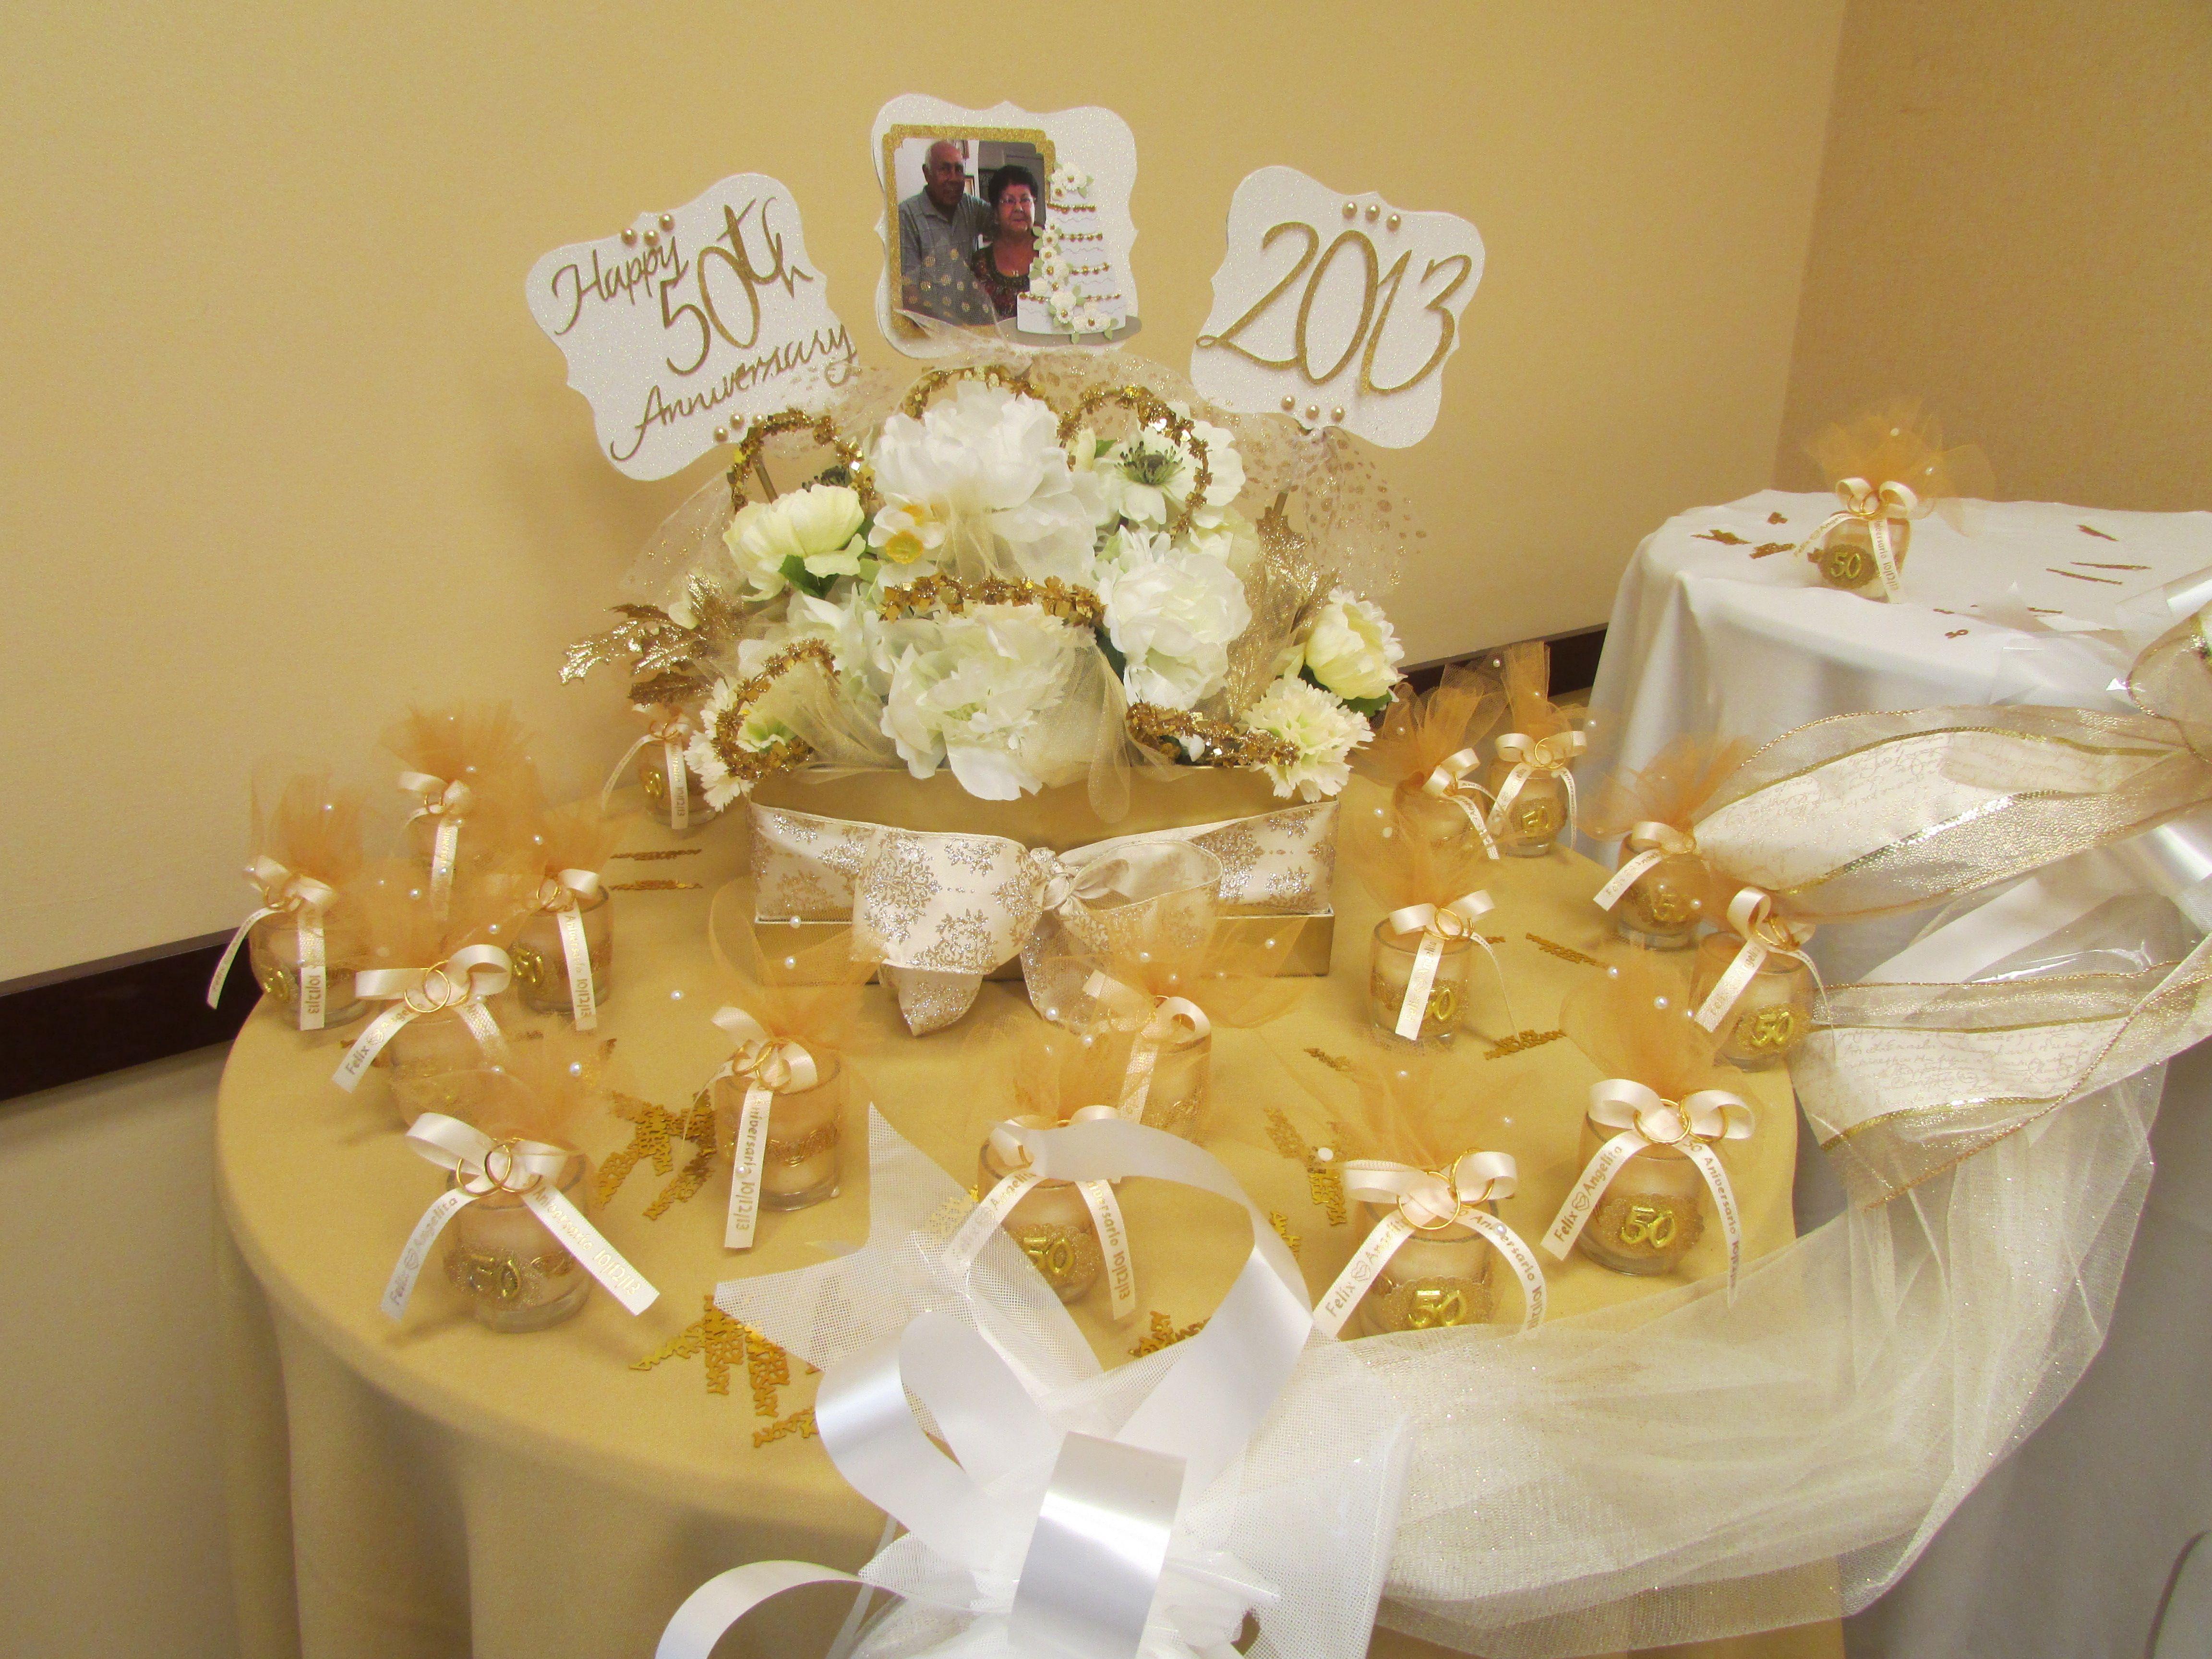 Cake Table Decor For 50th Anniversary Reception 50th Anniversary Reception Cake Table Decorations 50th Wedding Anniversary